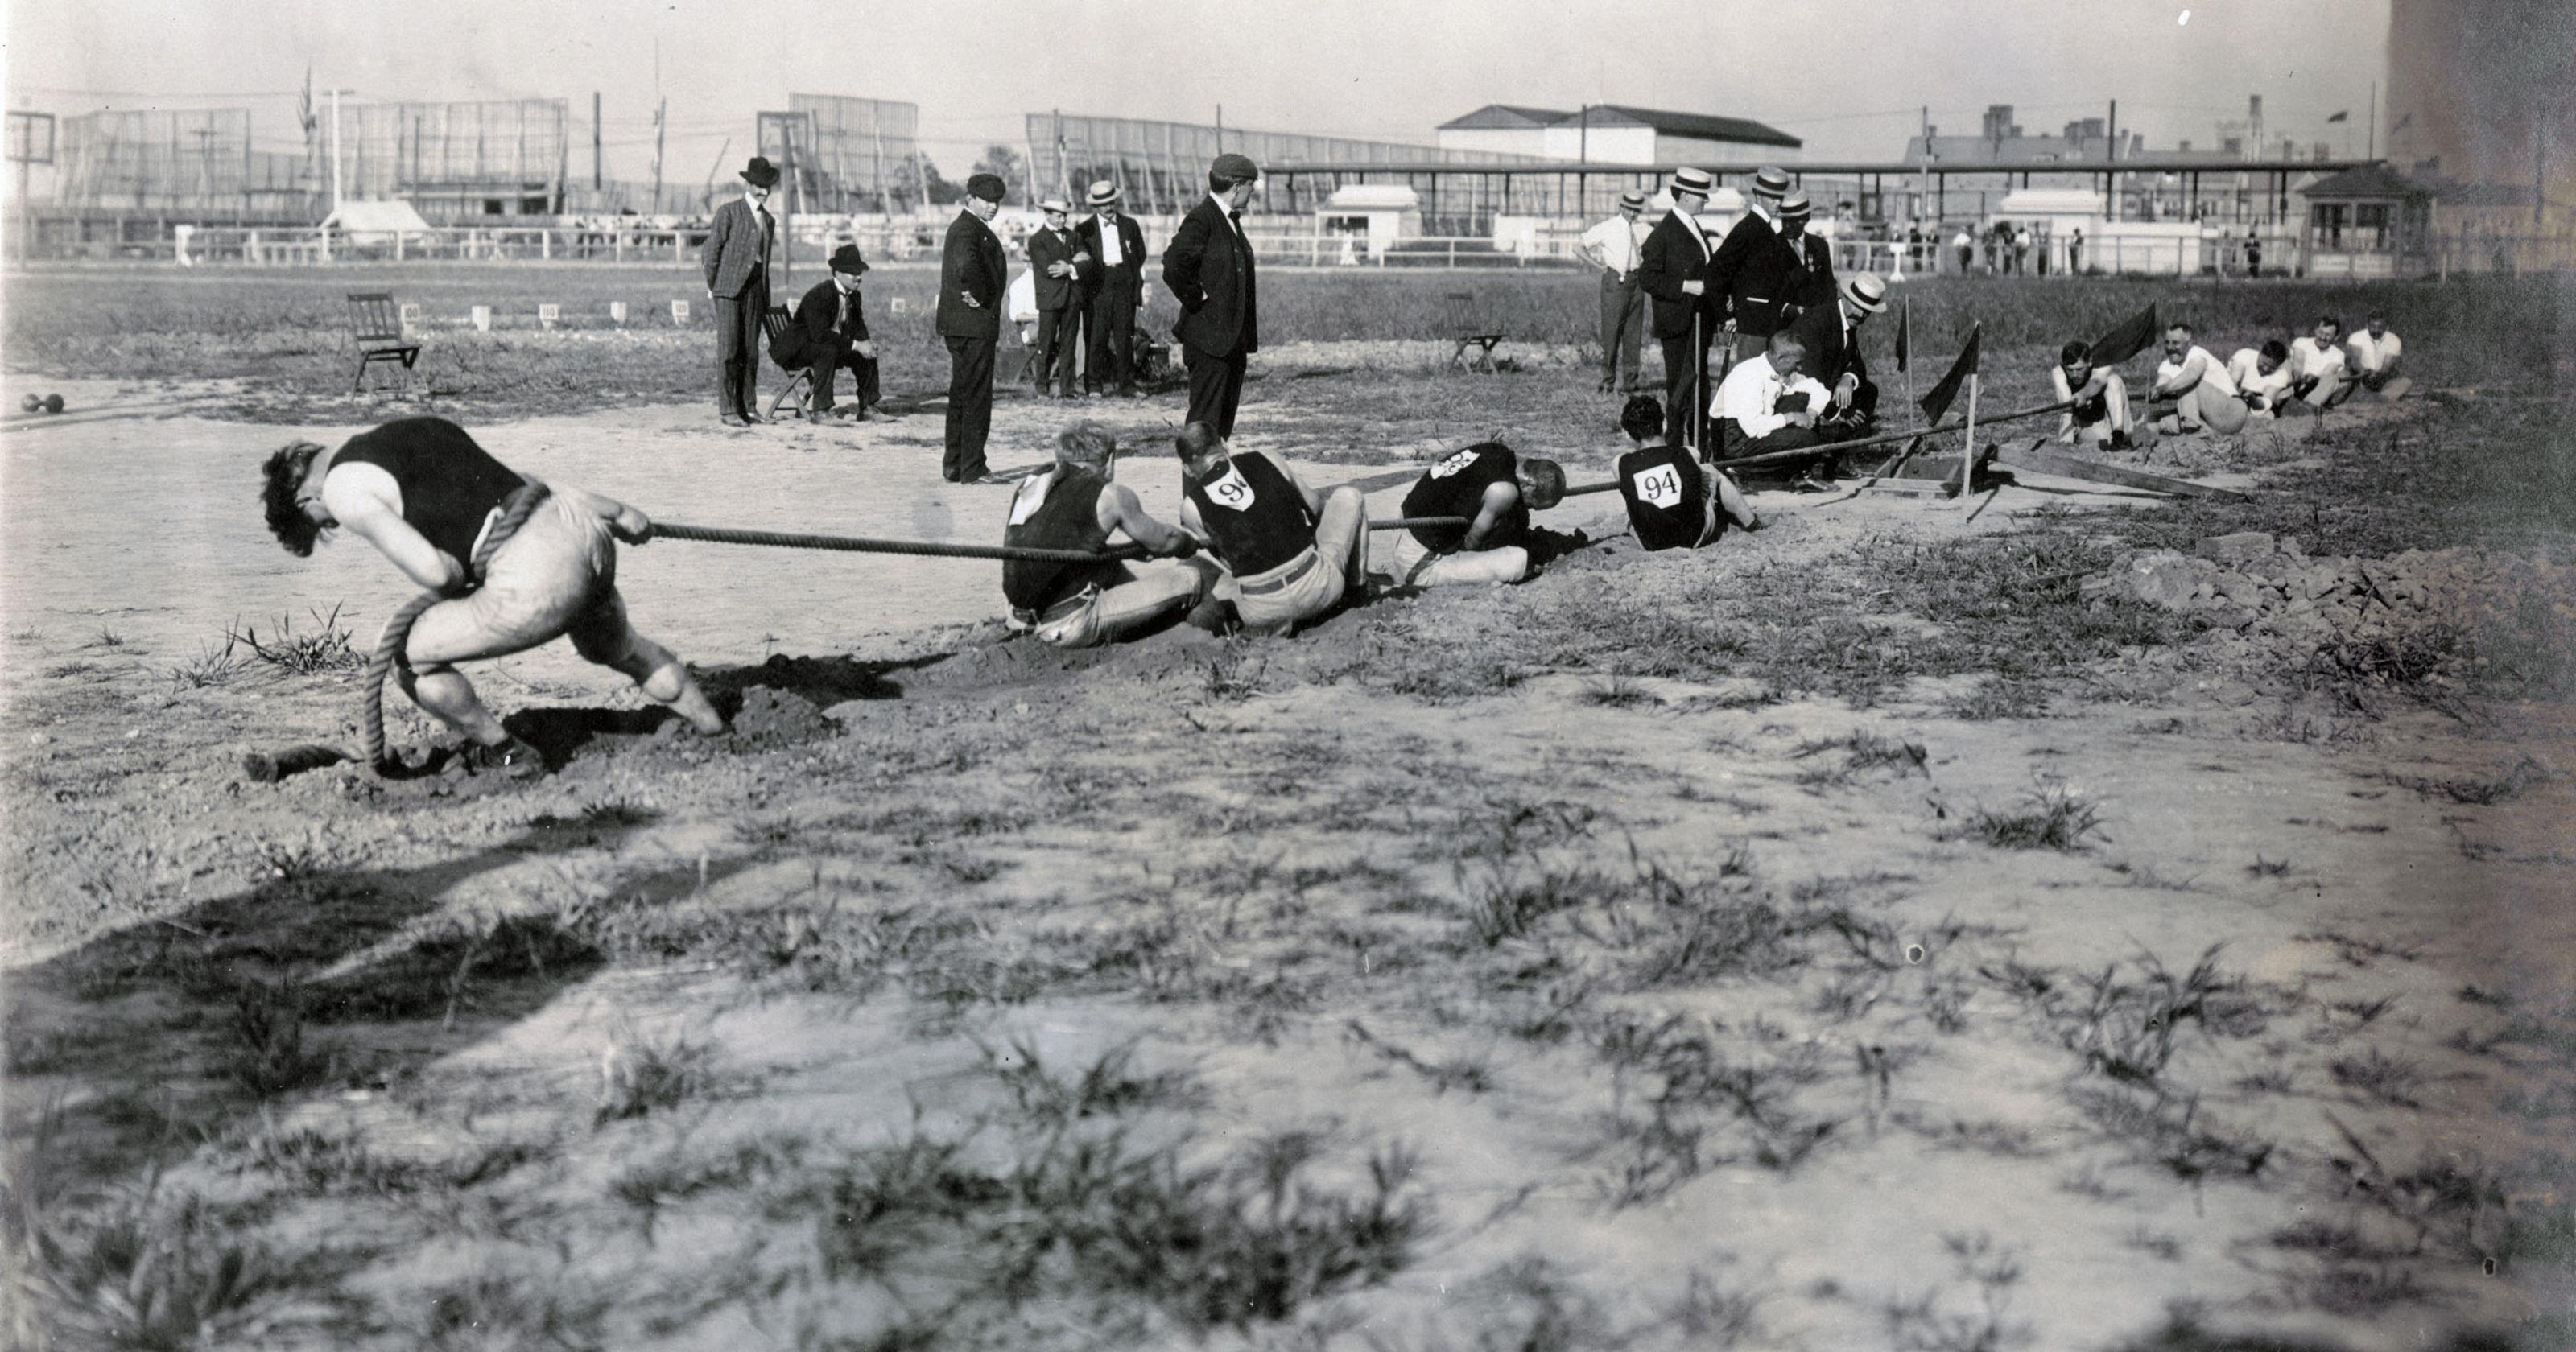 Tug-of-War – strange olympic sport